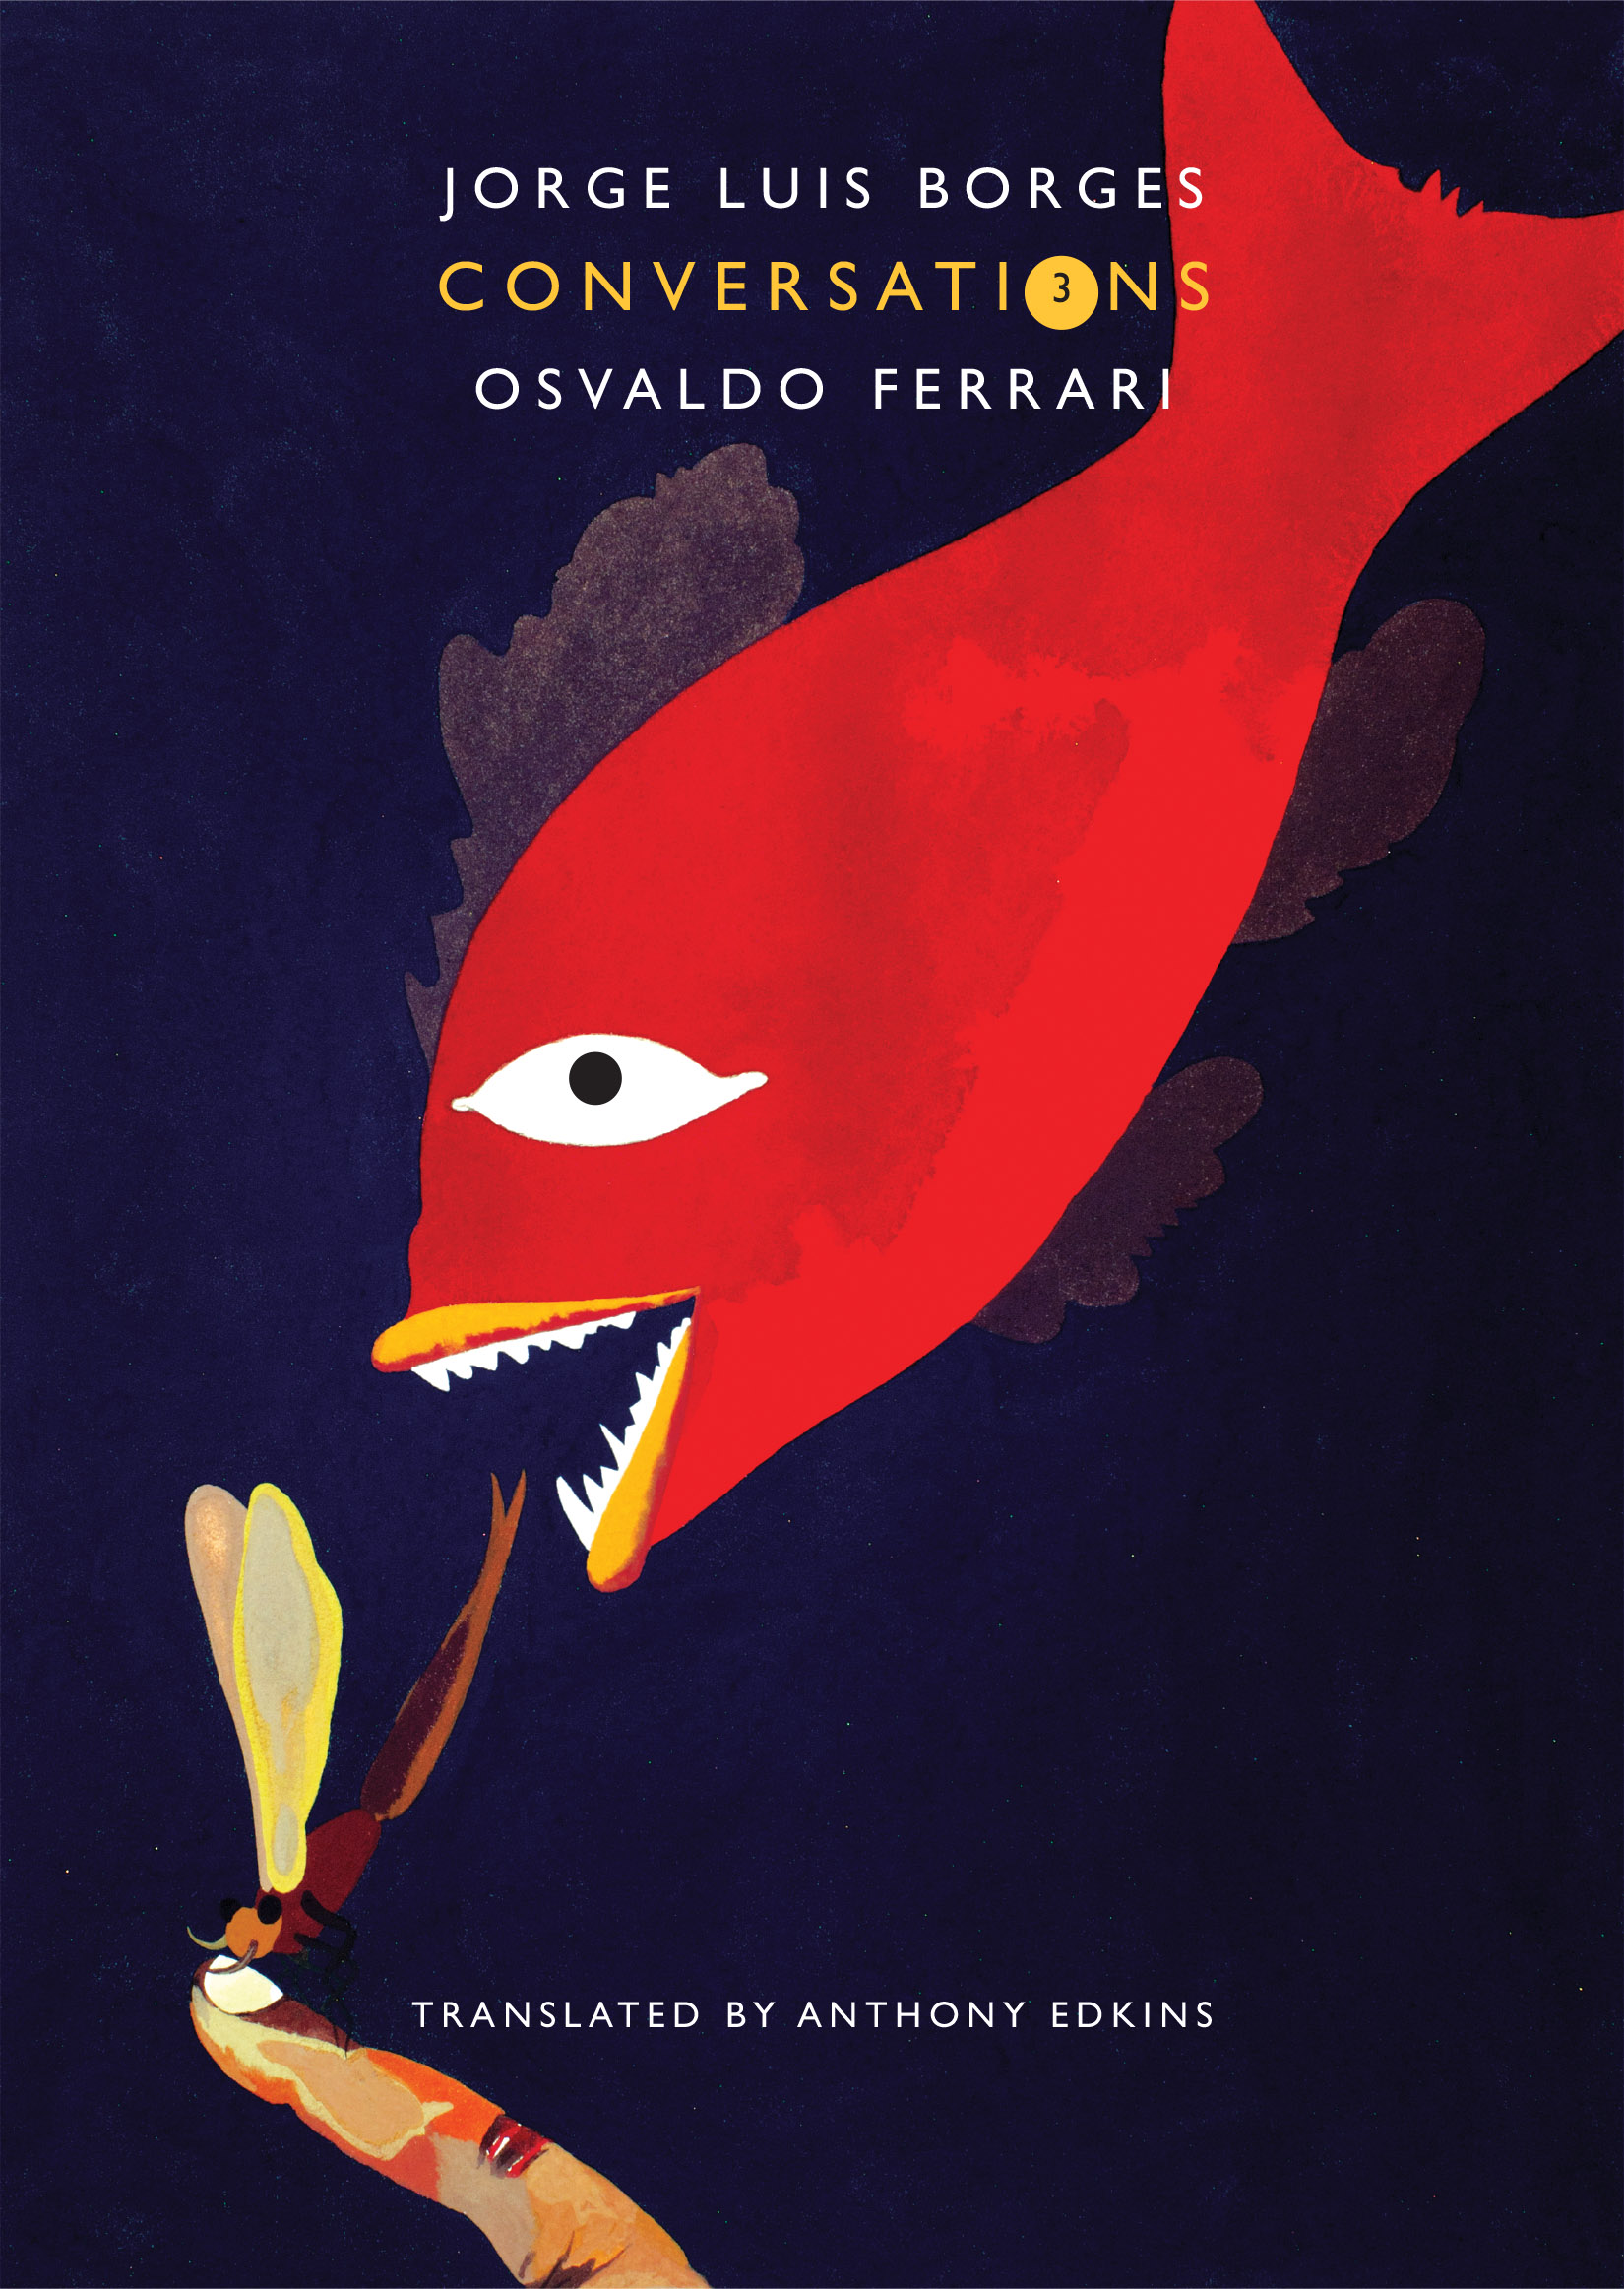 Conversations, Volume 3 | Jorge Luis Borges, Osvaldo Ferrari | Seagull Books